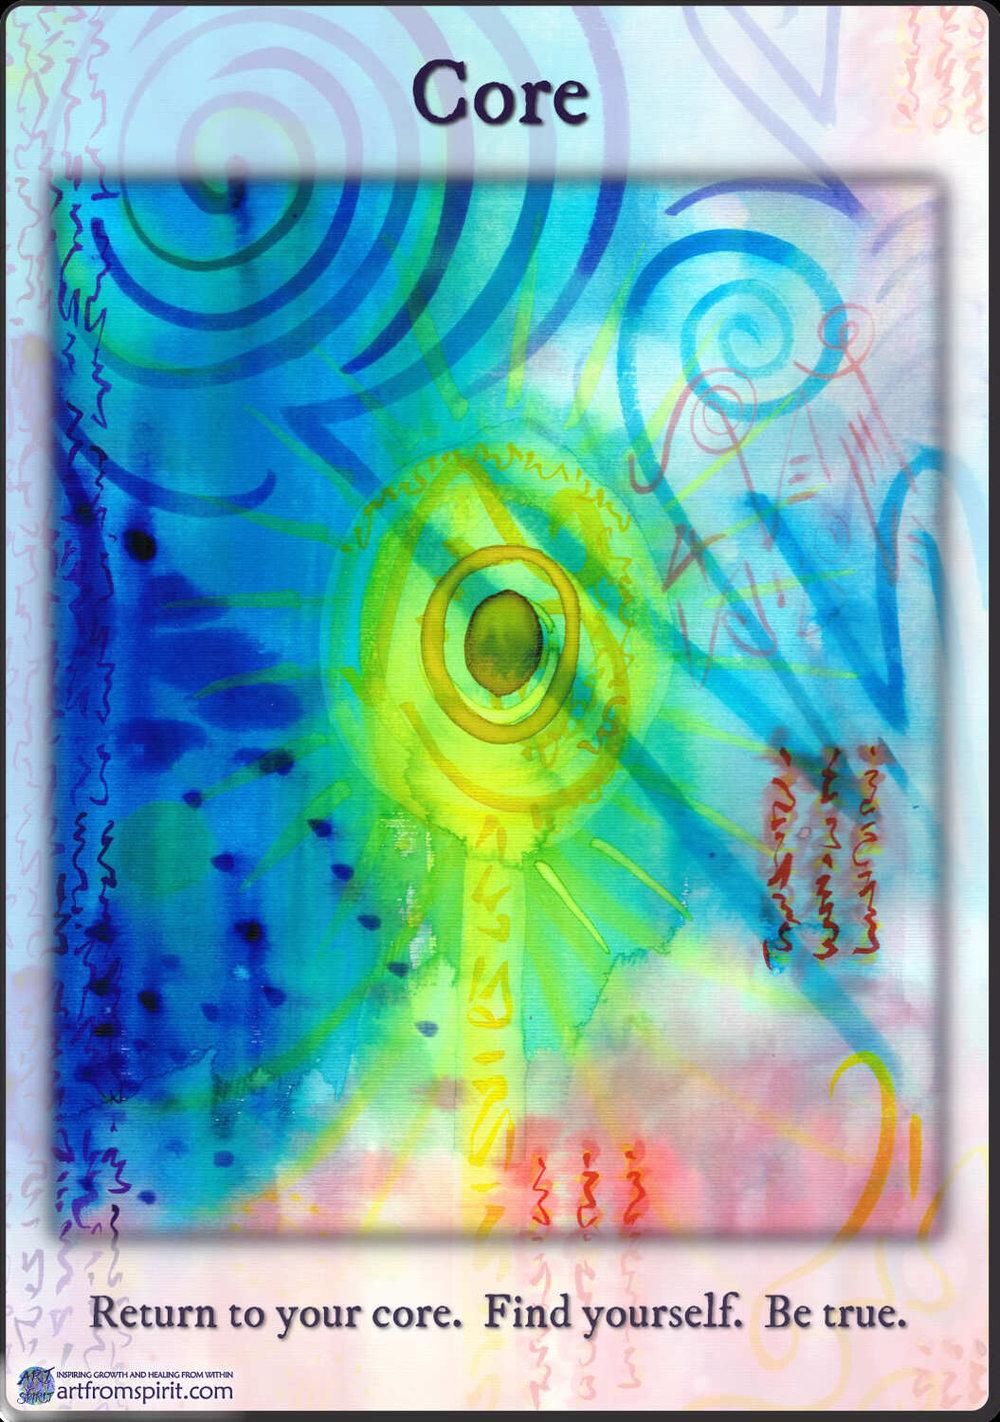 core-self-discovery-inspirational-cards-tegan-neville-art-from-spirit.jpg